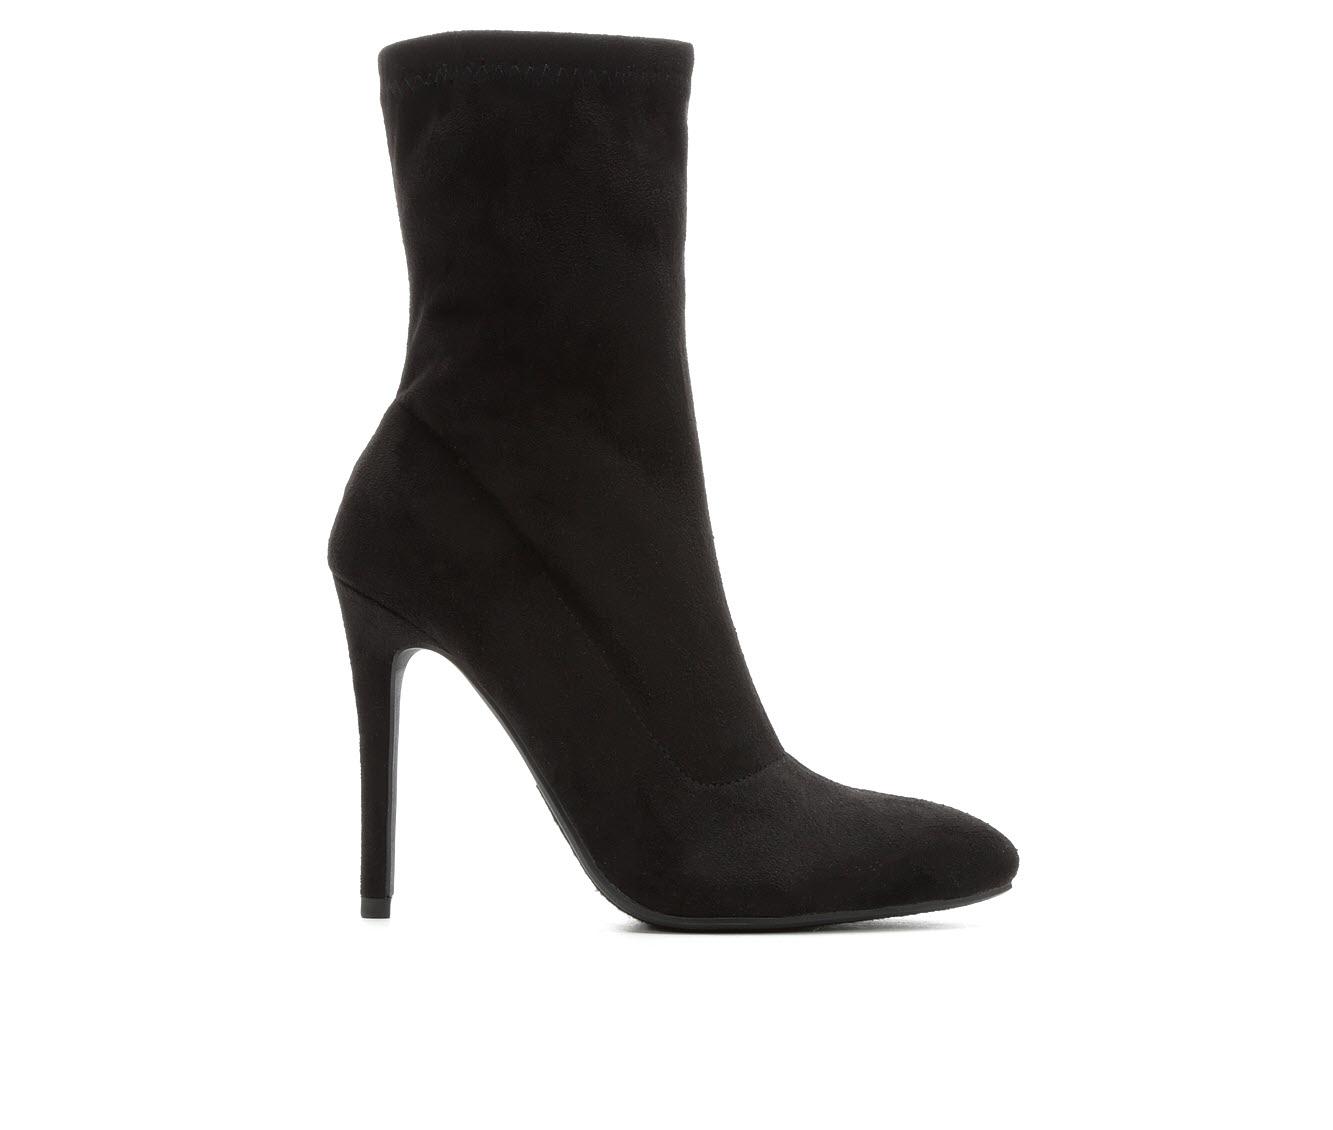 Y-Not Dean Women's Boot (Black Faux Leather)